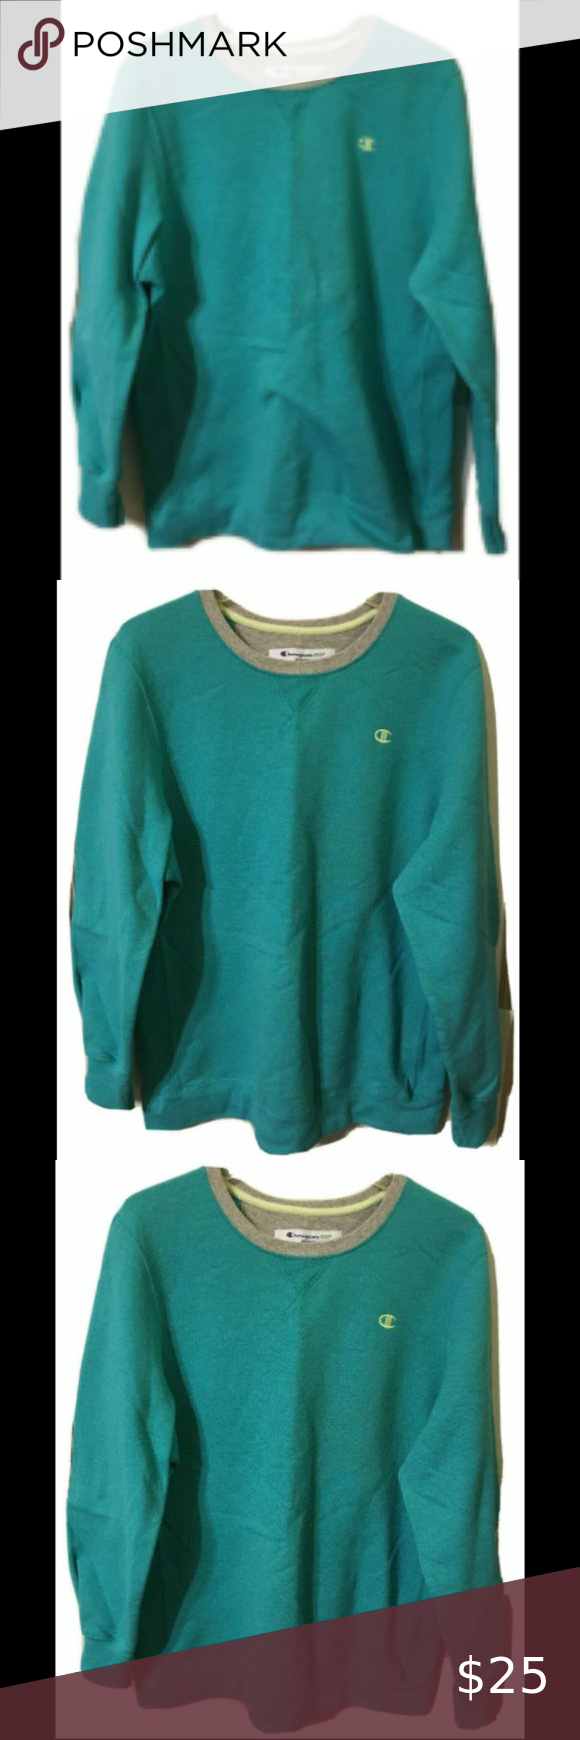 Champion Eco Sweatshirt Sz L Turquoise Logo Men In 2021 Crop Top With Jeans Black Champion Hoodie Sweatshirts [ 1740 x 580 Pixel ]